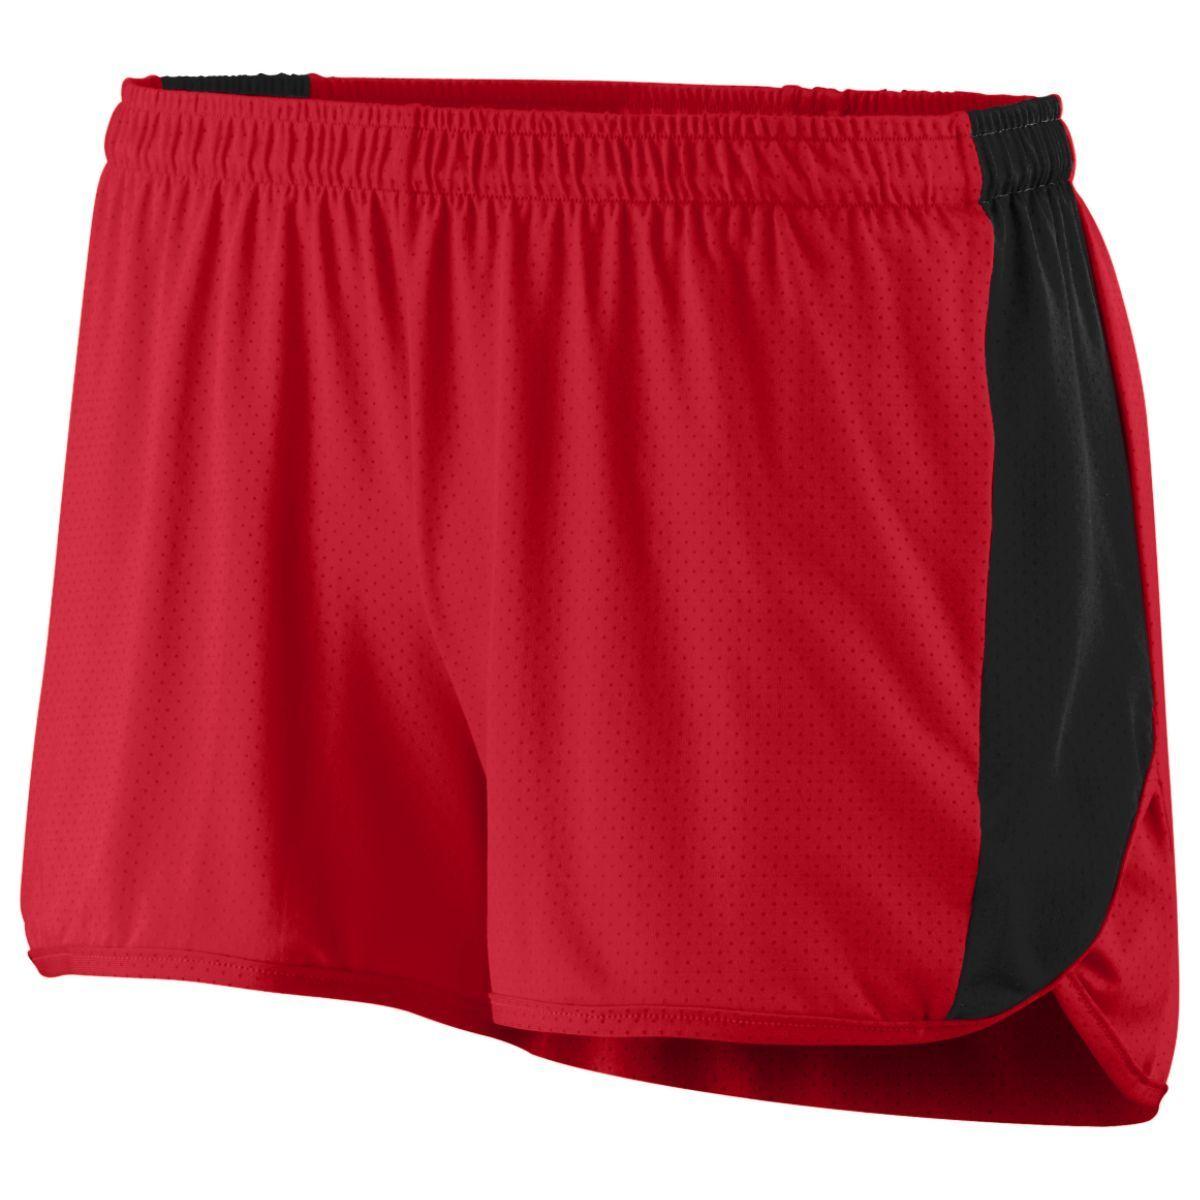 Ladies Sprint Shorts - RED/BLACK